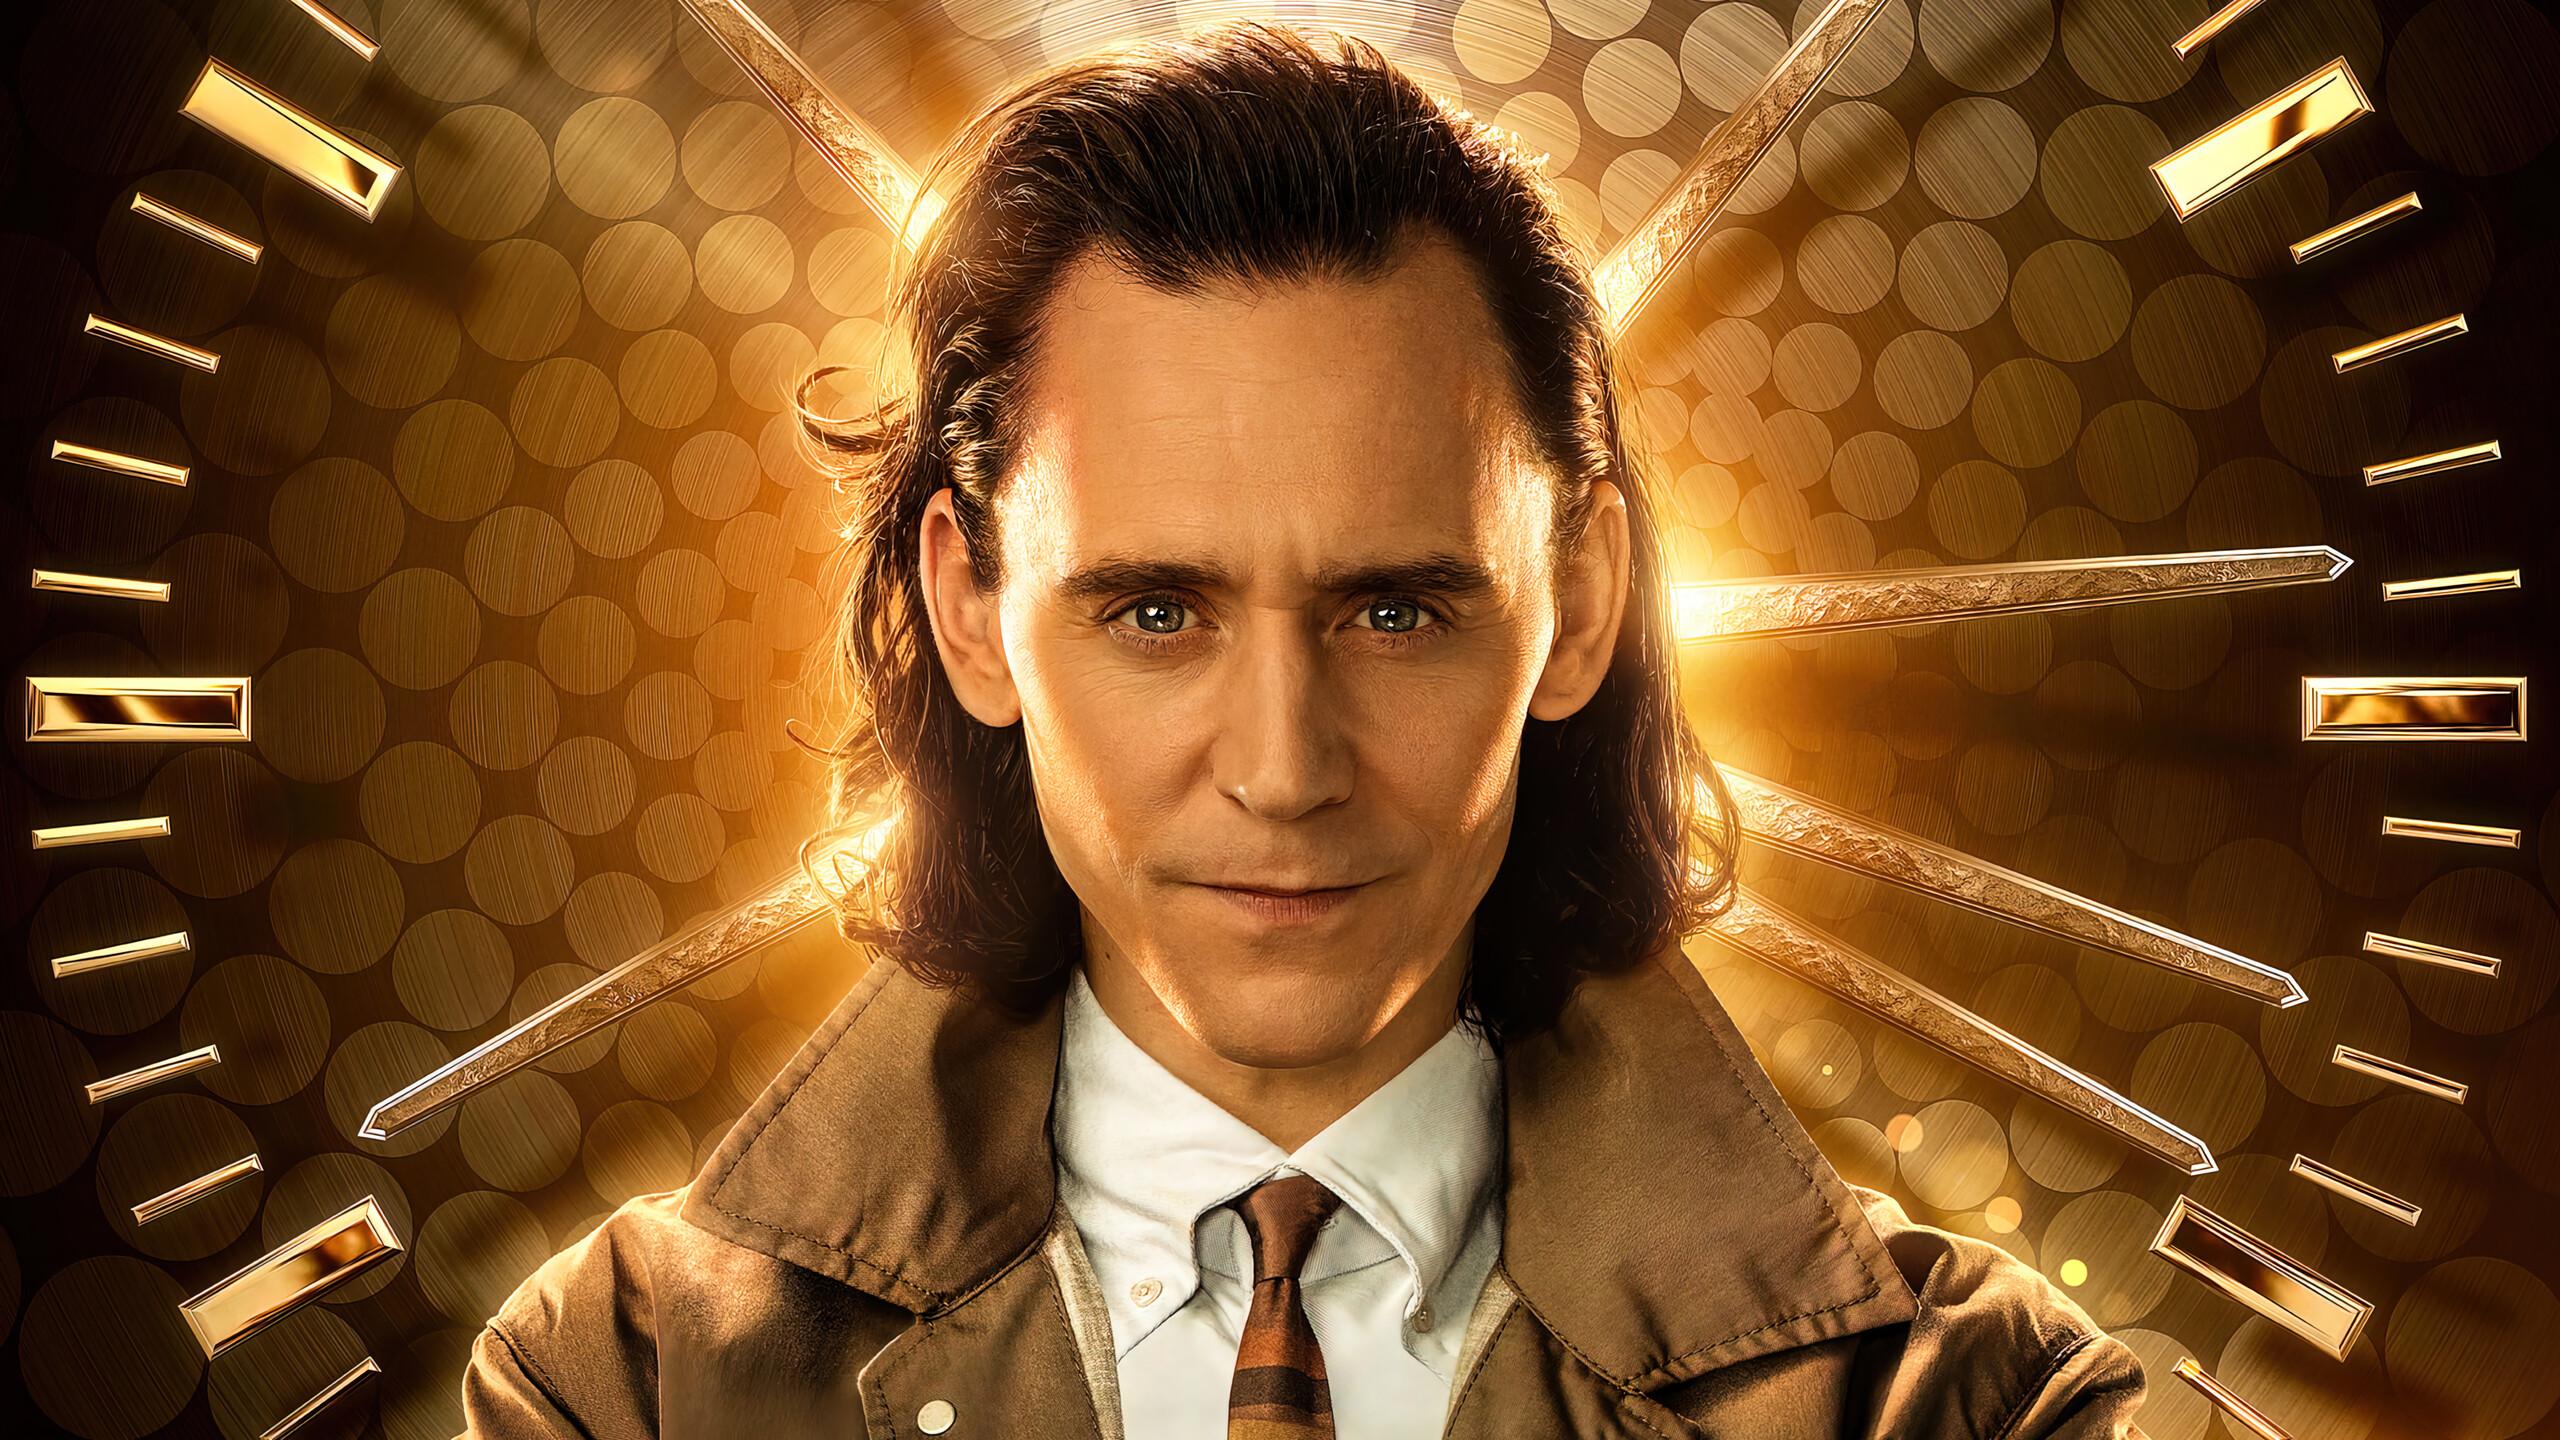 Loki TV Series Tom Hiddleston 4K Phone iPhone Wallpaper 7980a 2560x1440